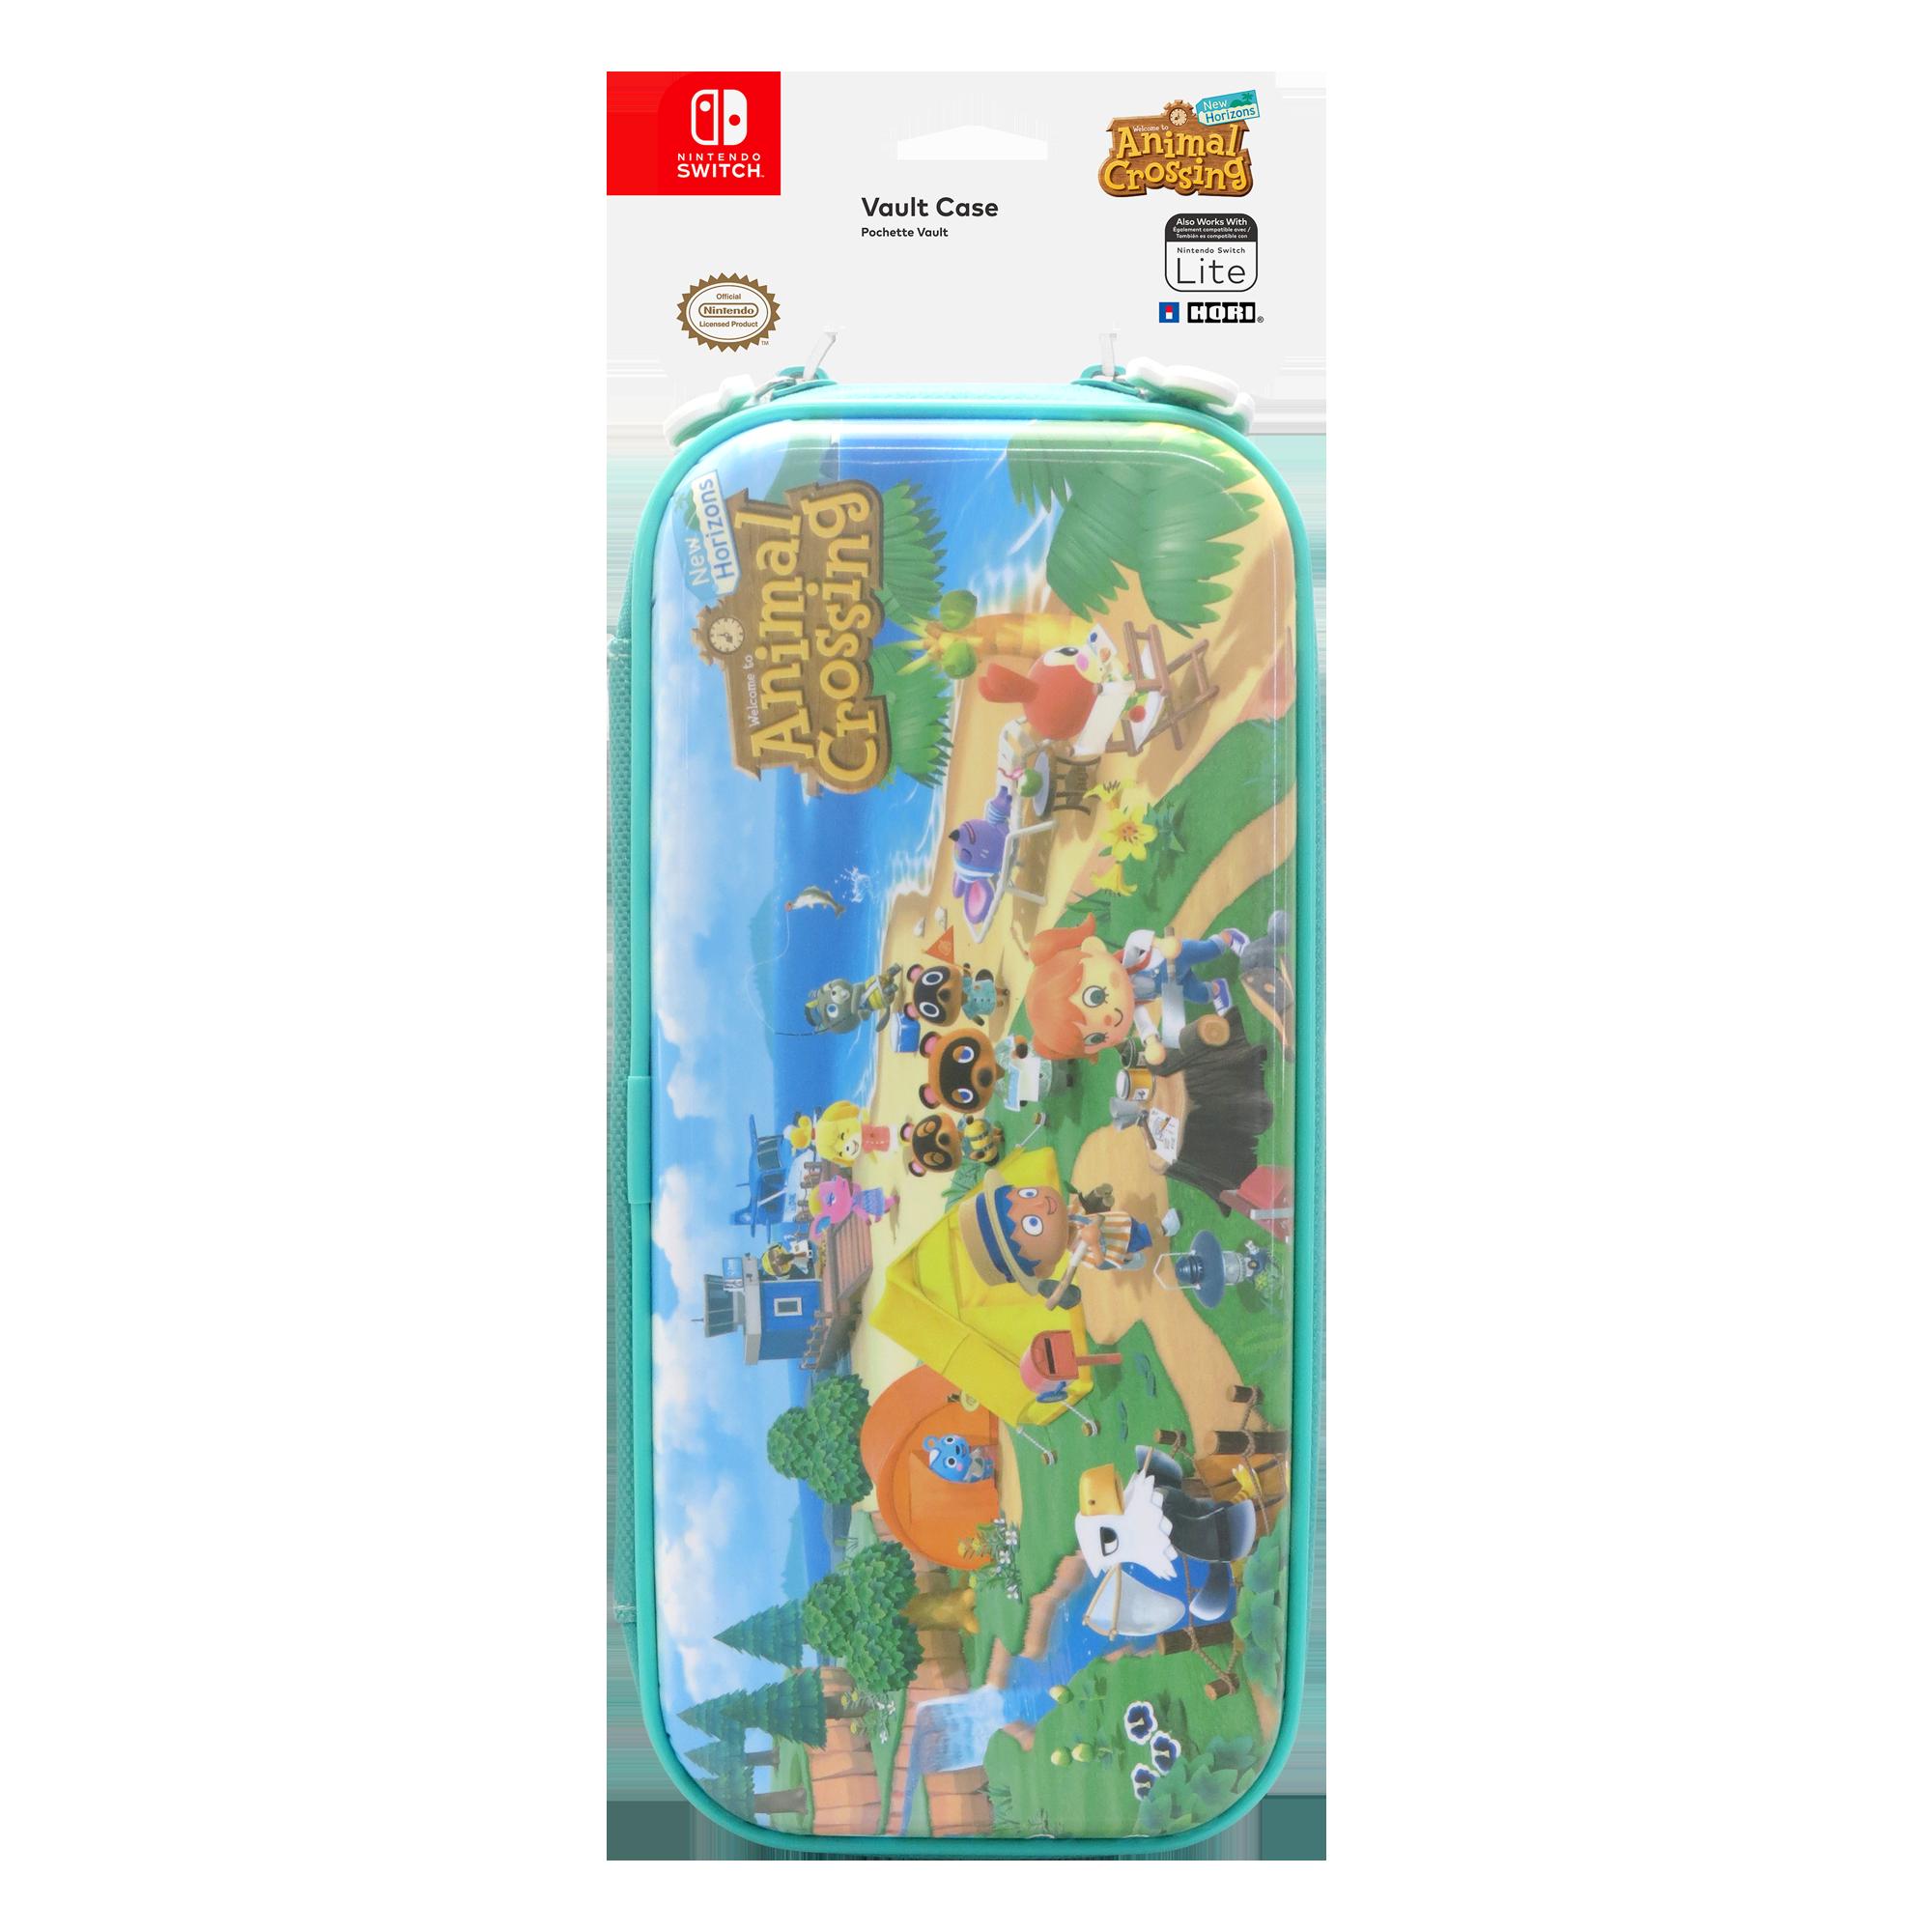 Hori Premium Vault Case Nintendo Switch/Switch Lite (Animal Crossing)